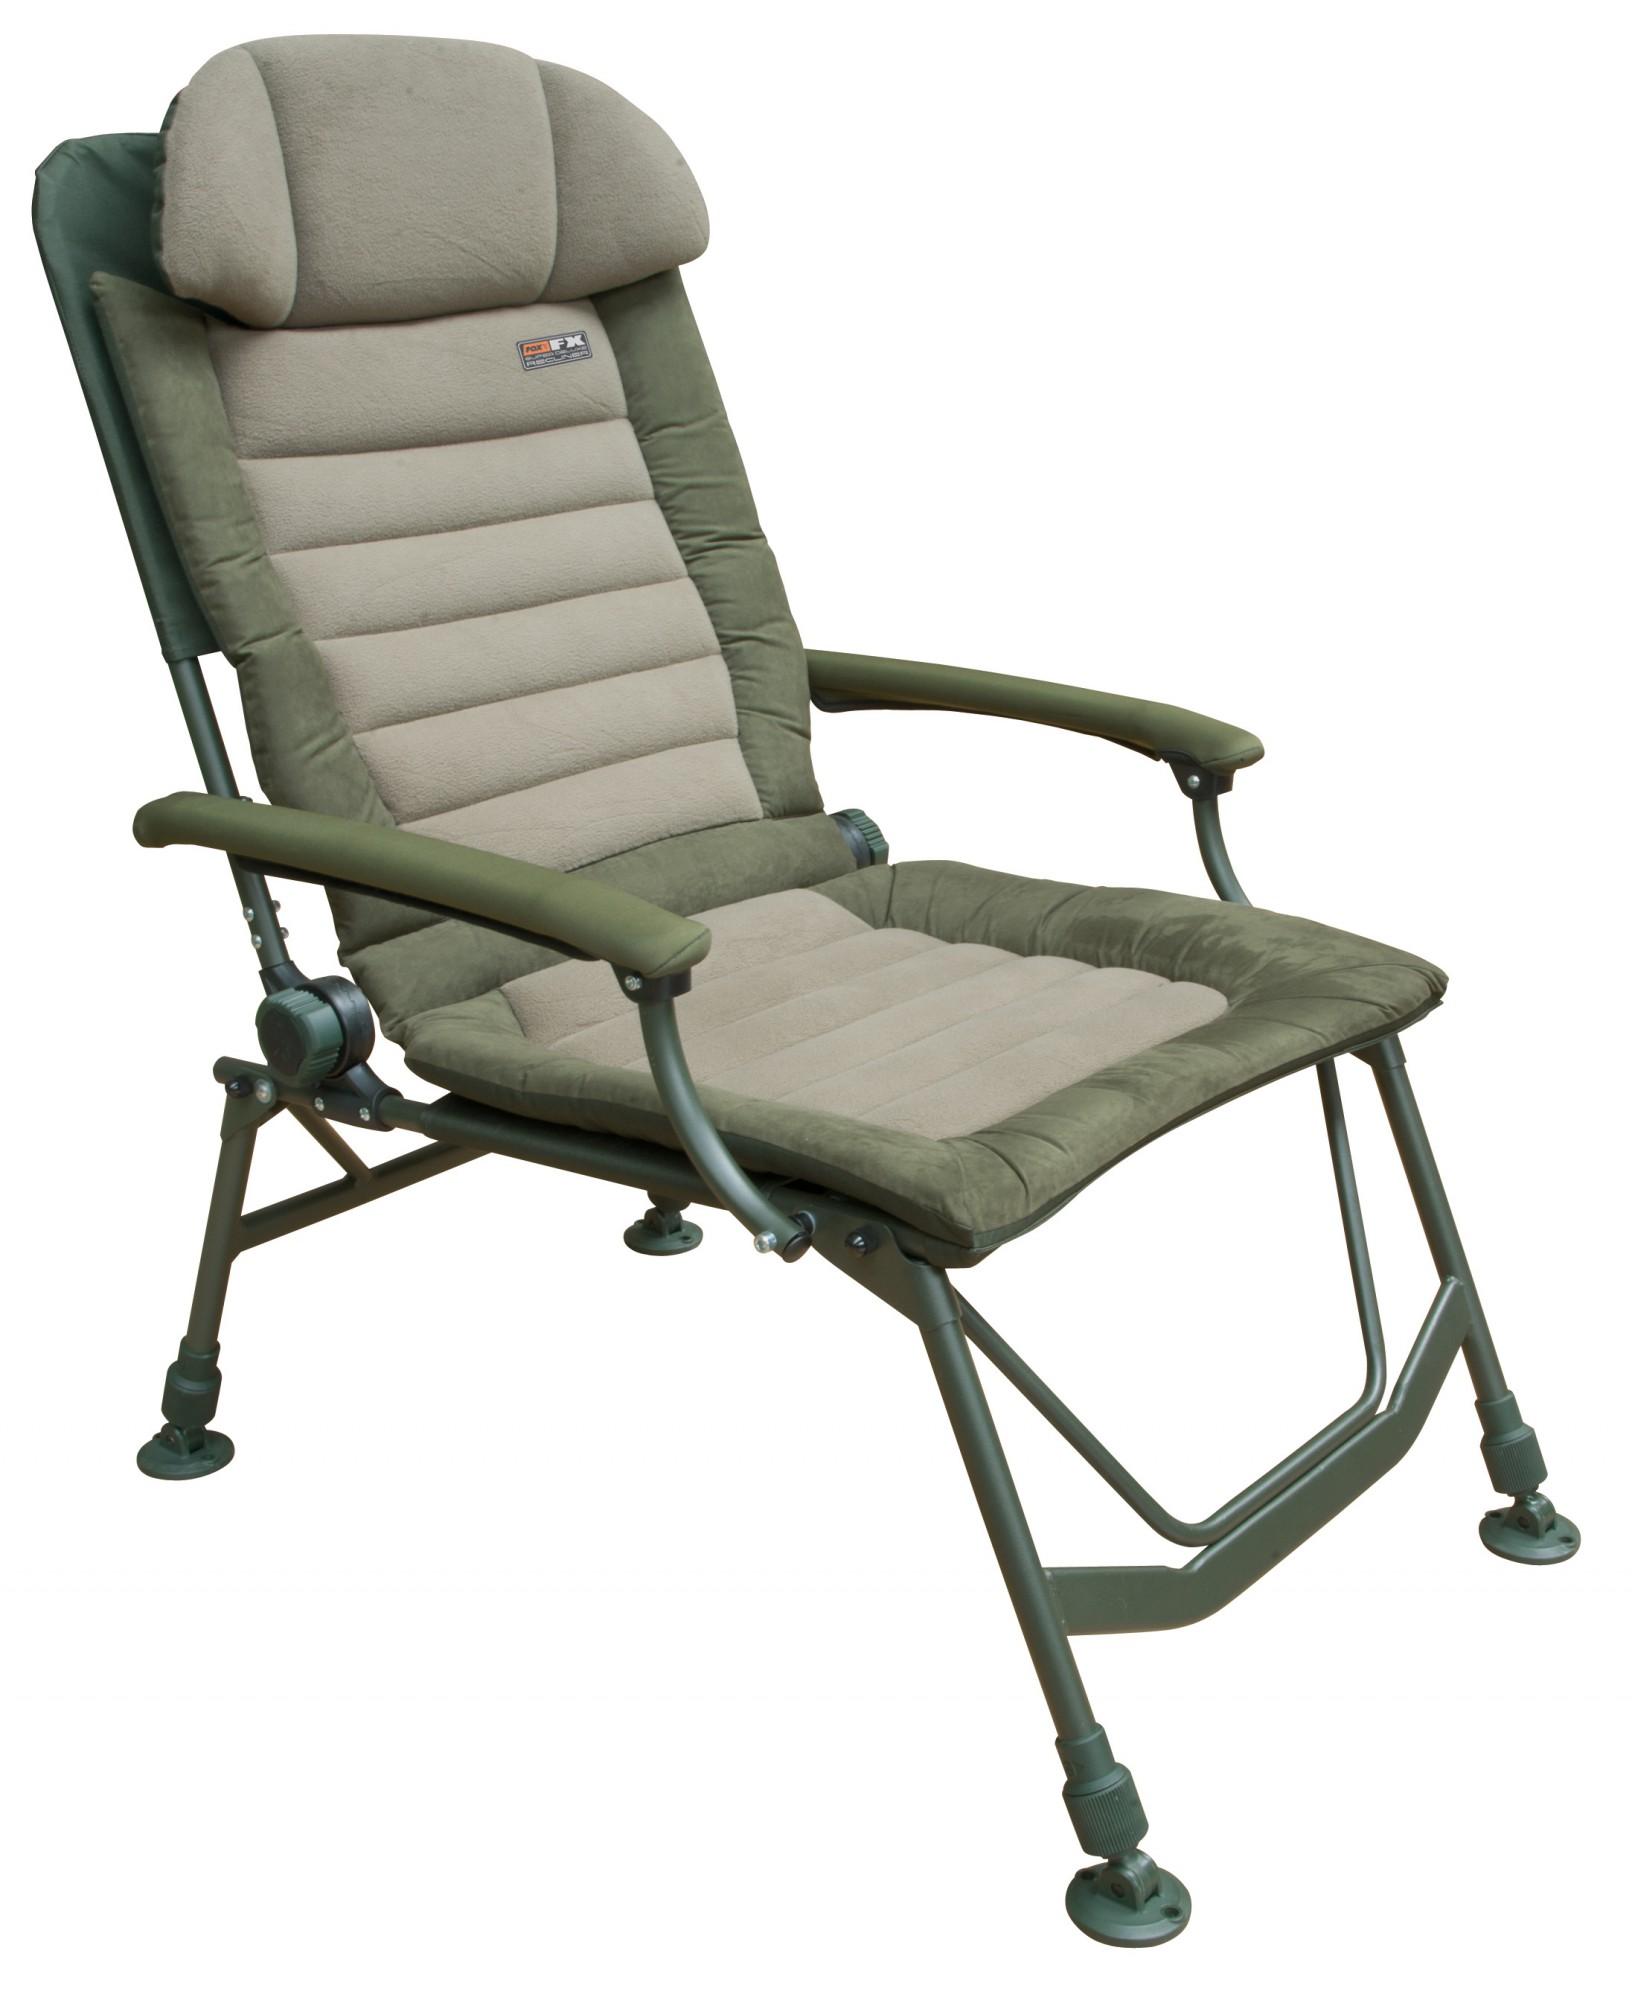 Fox Fx Super Deluxe Recliner Chair Stuhl Angelstuhl